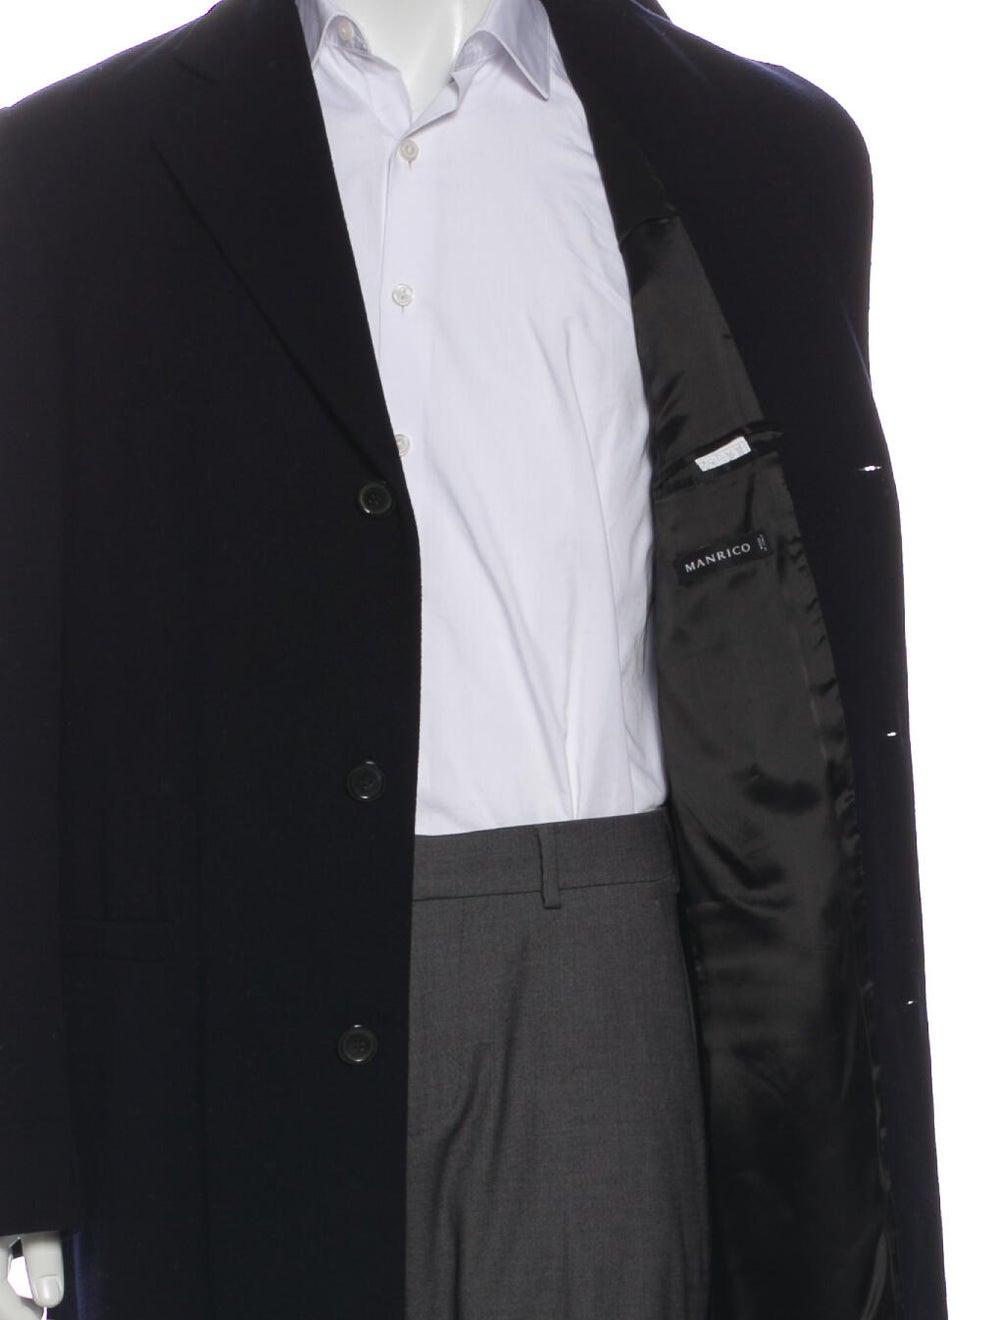 Manrico Cashmere Cashmere Overcoat Black - image 4